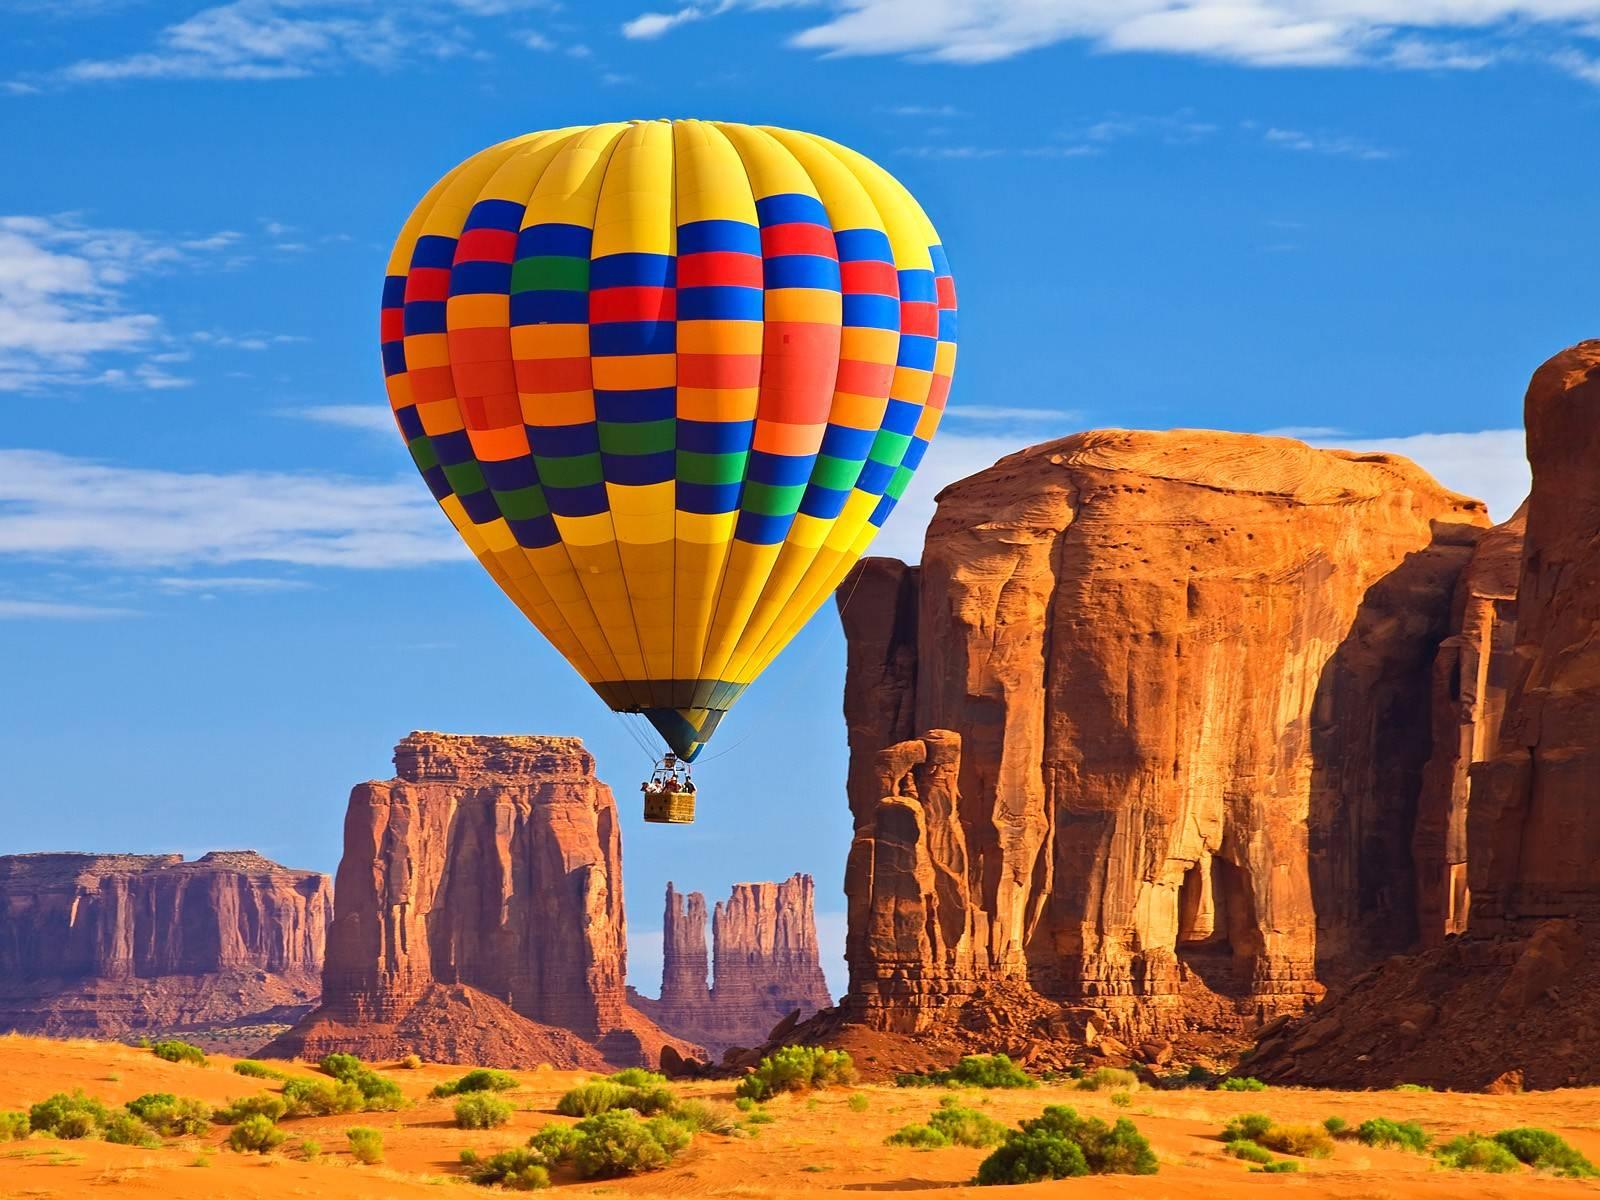 Desert Arizona 16001200 Wallpaper 2385806 1600x1200